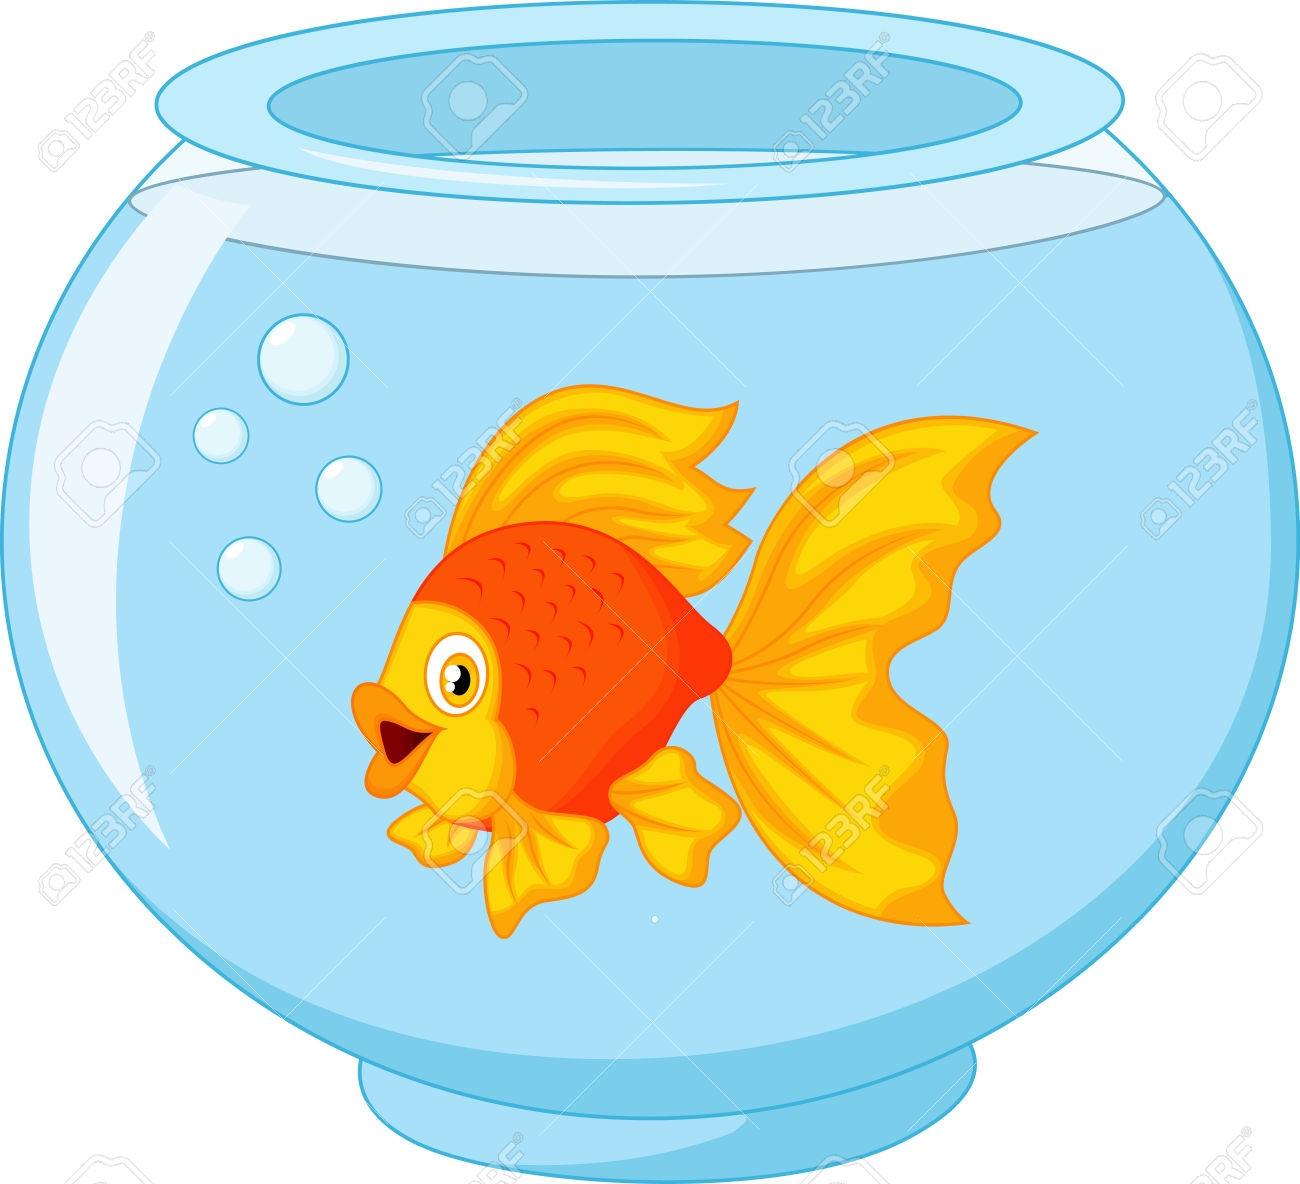 fishbowl clipartlook. Goldfish clipart 5 fish